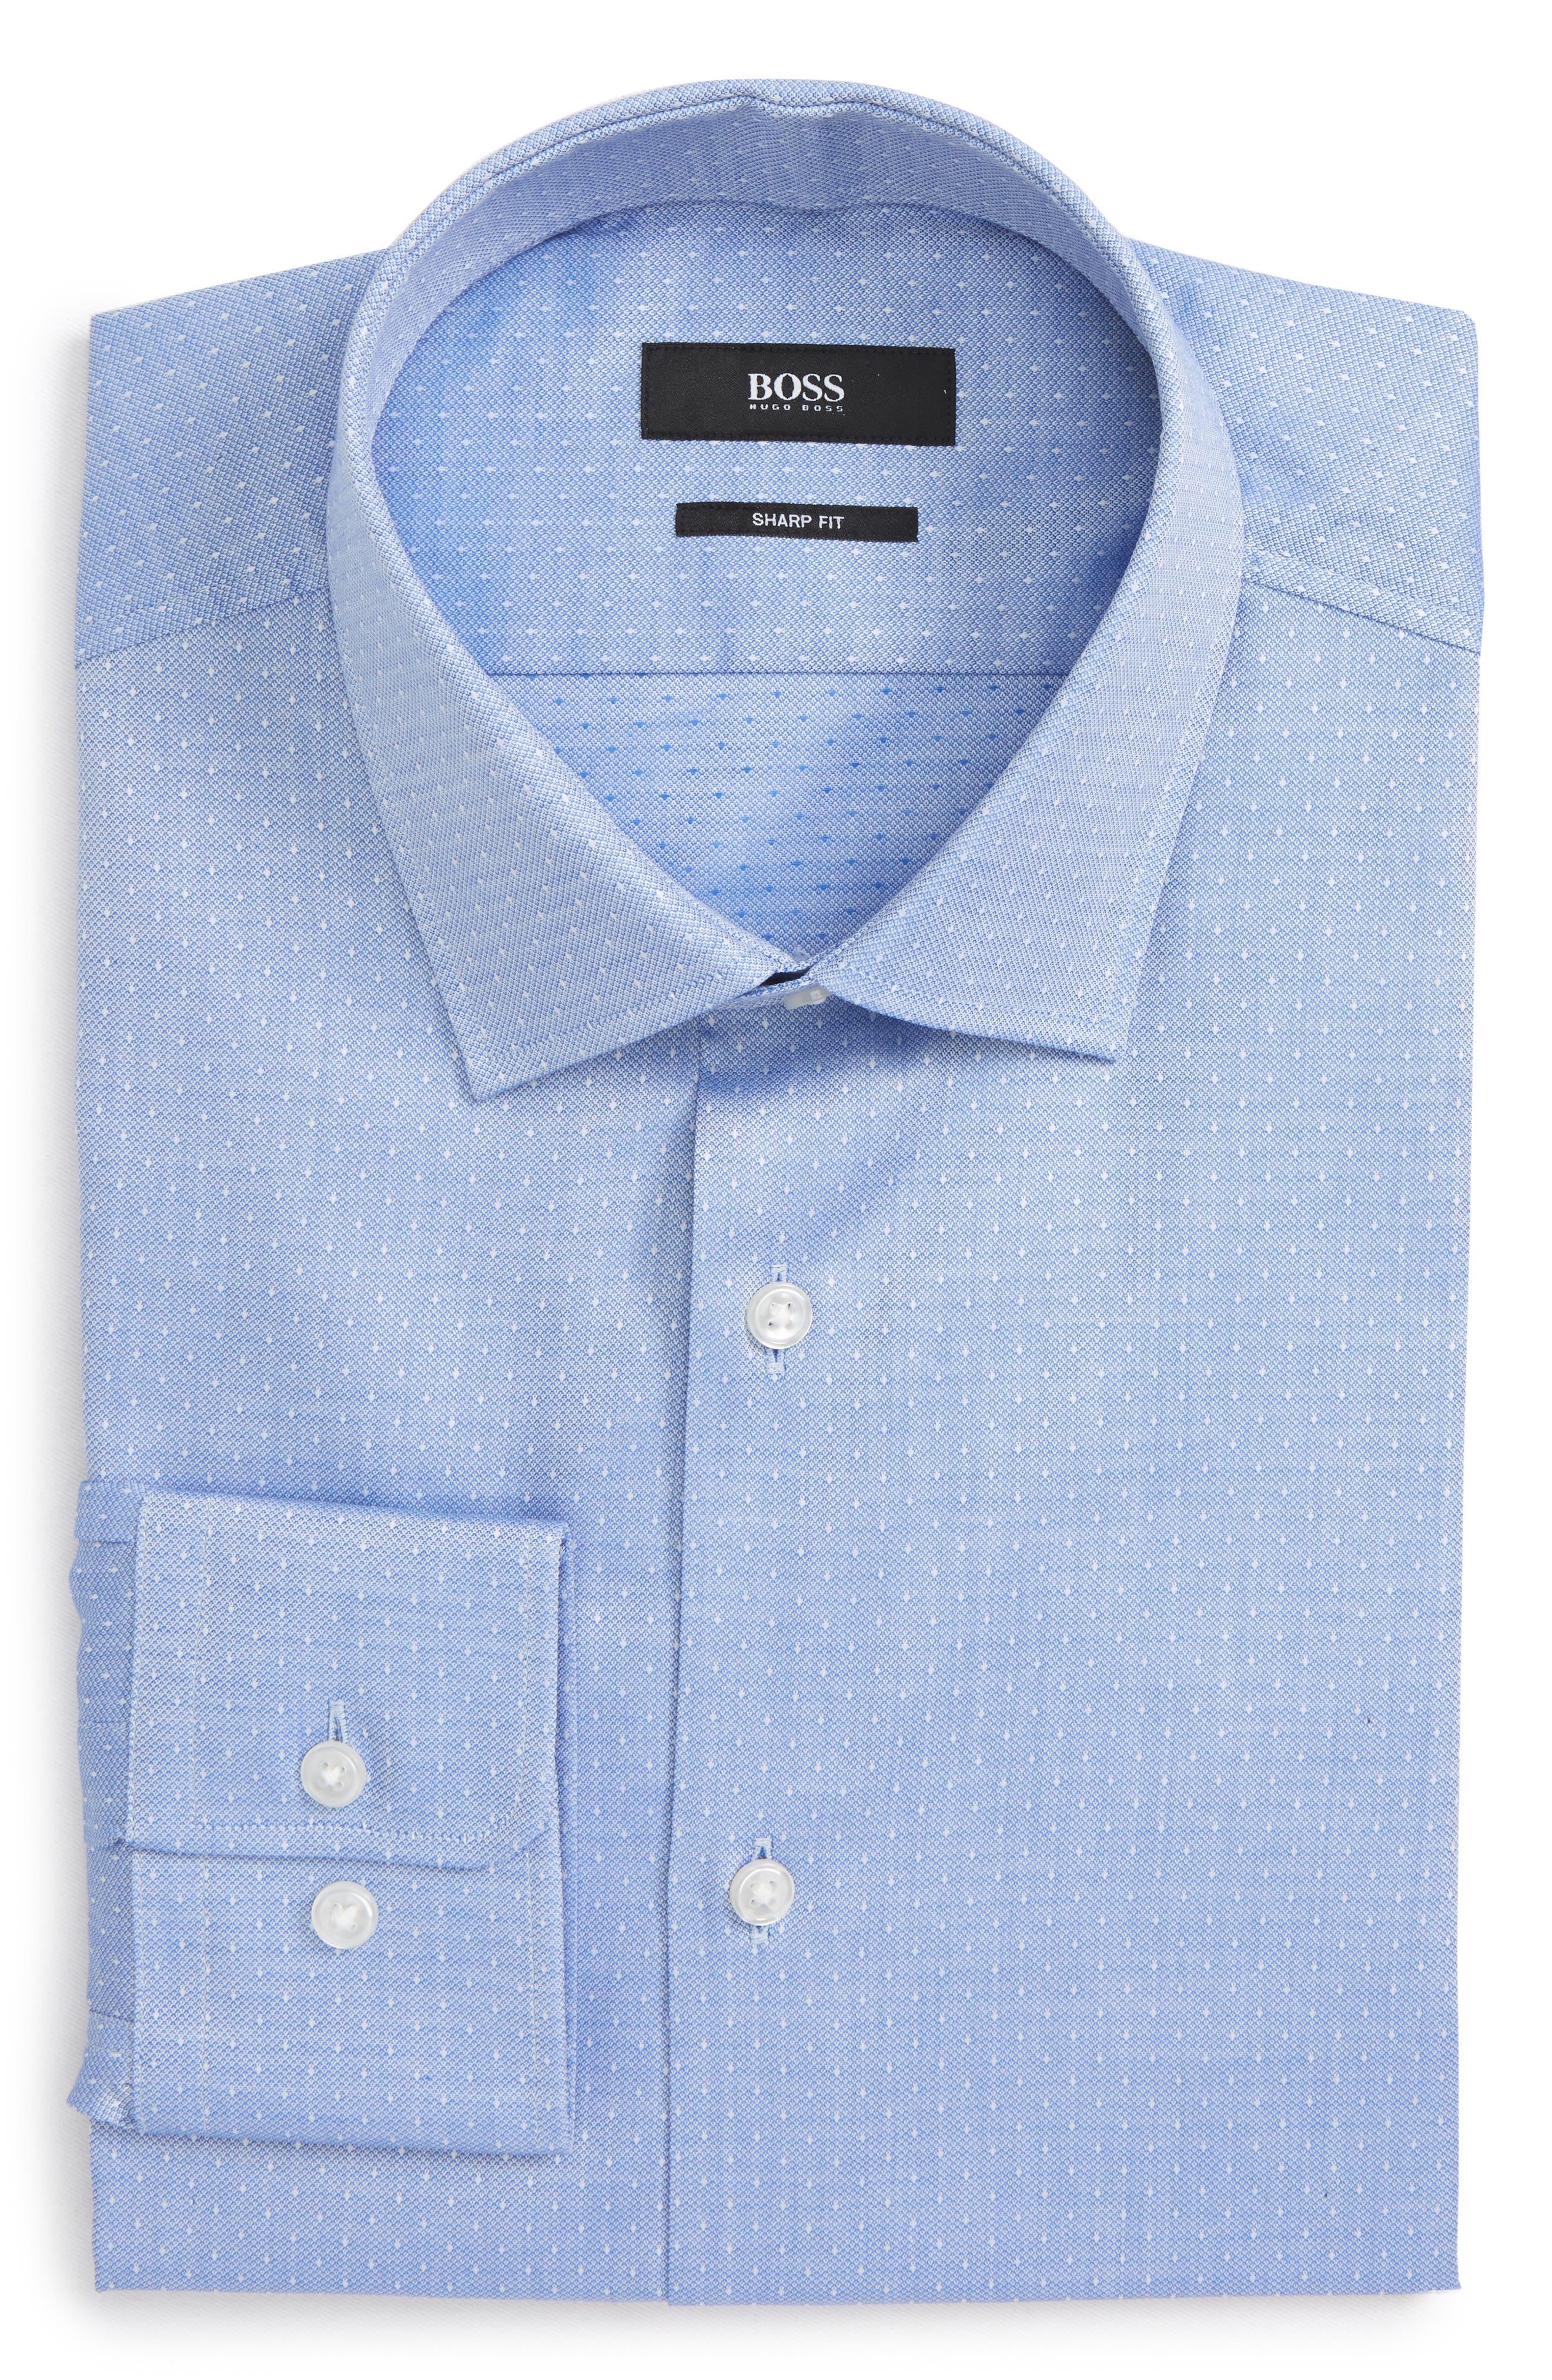 Mark Sharp Fit Dress Shirt,                         Main,                         color, Blue